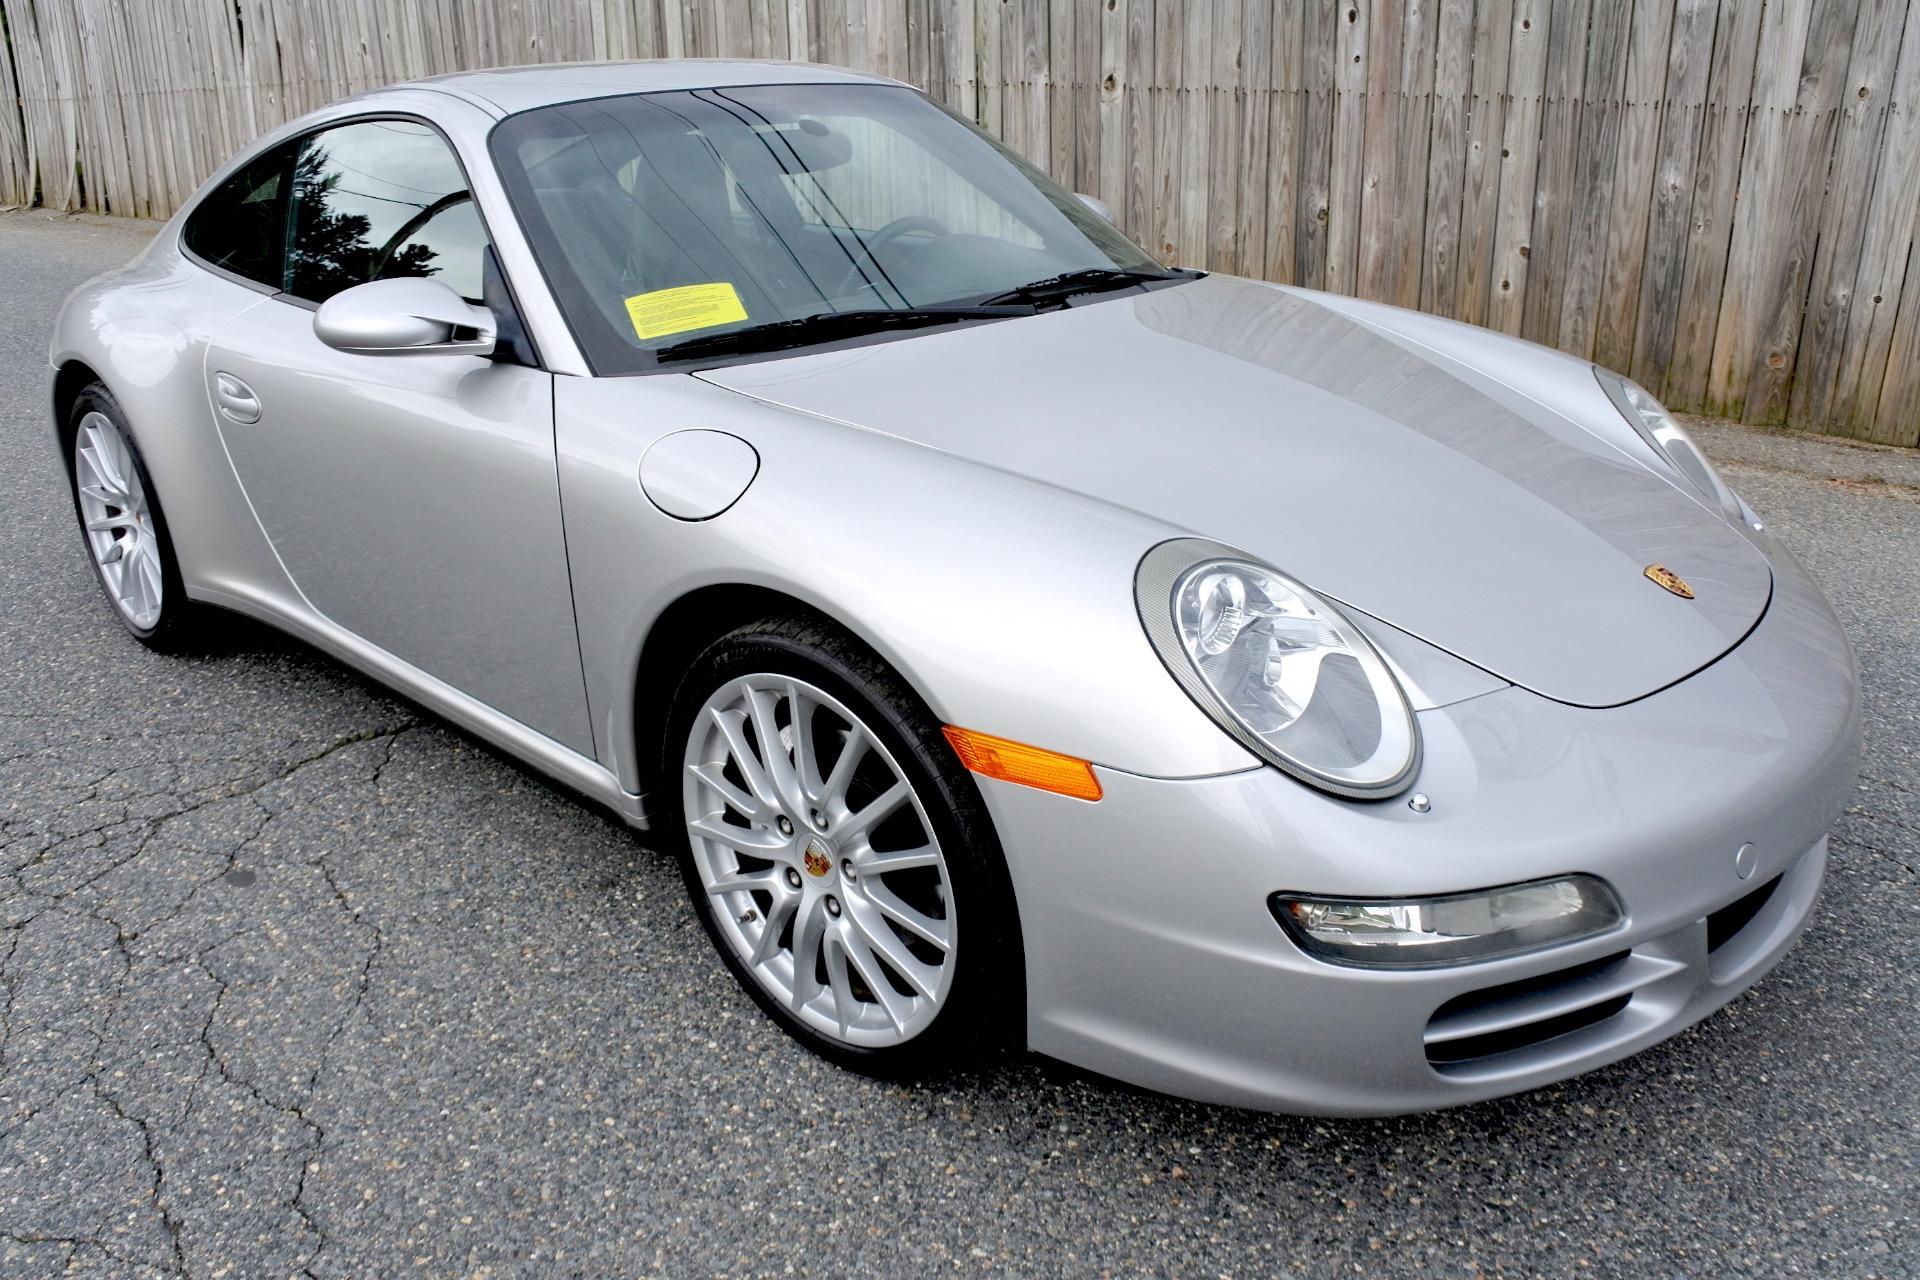 Used 2006 Porsche 911 Carrera 4 Used 2006 Porsche 911 Carrera 4 for sale  at Metro West Motorcars LLC in Shrewsbury MA 7